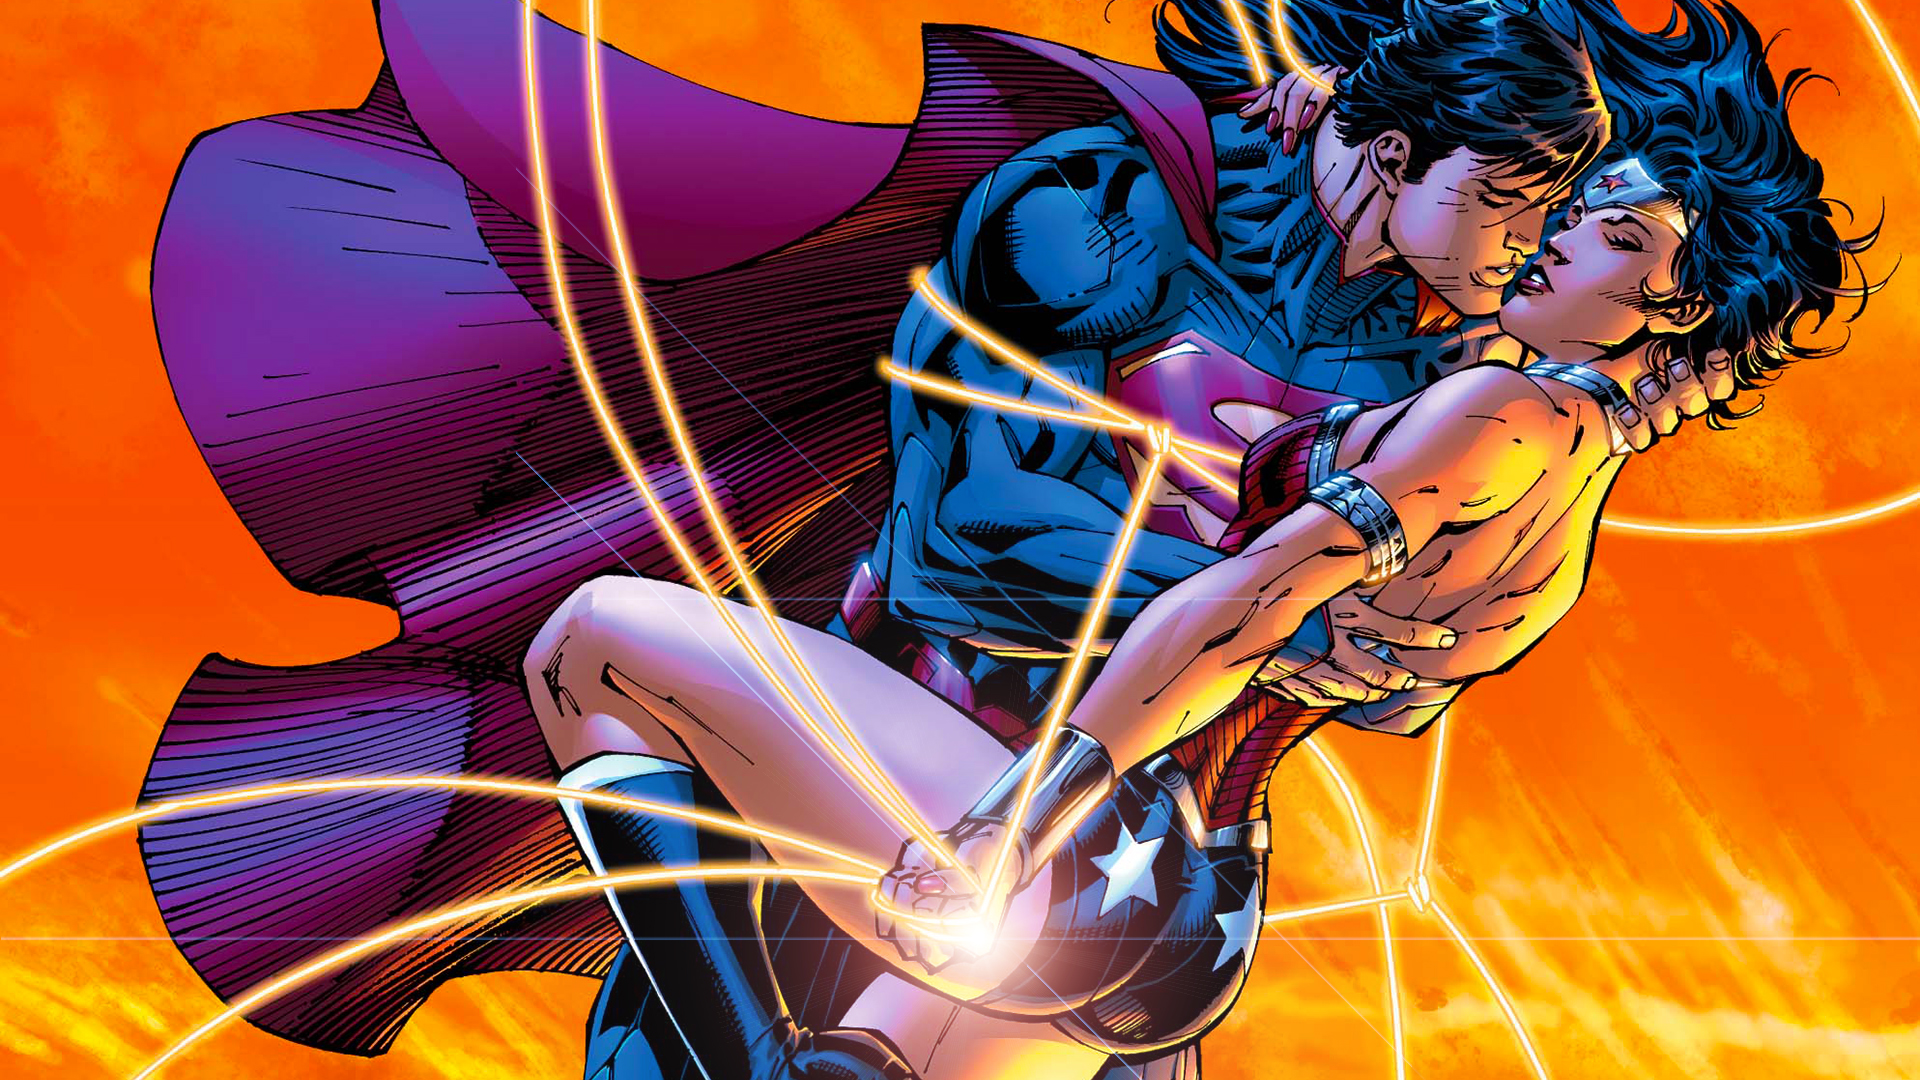 Superman/Wonder Woman by Xionice on deviantART